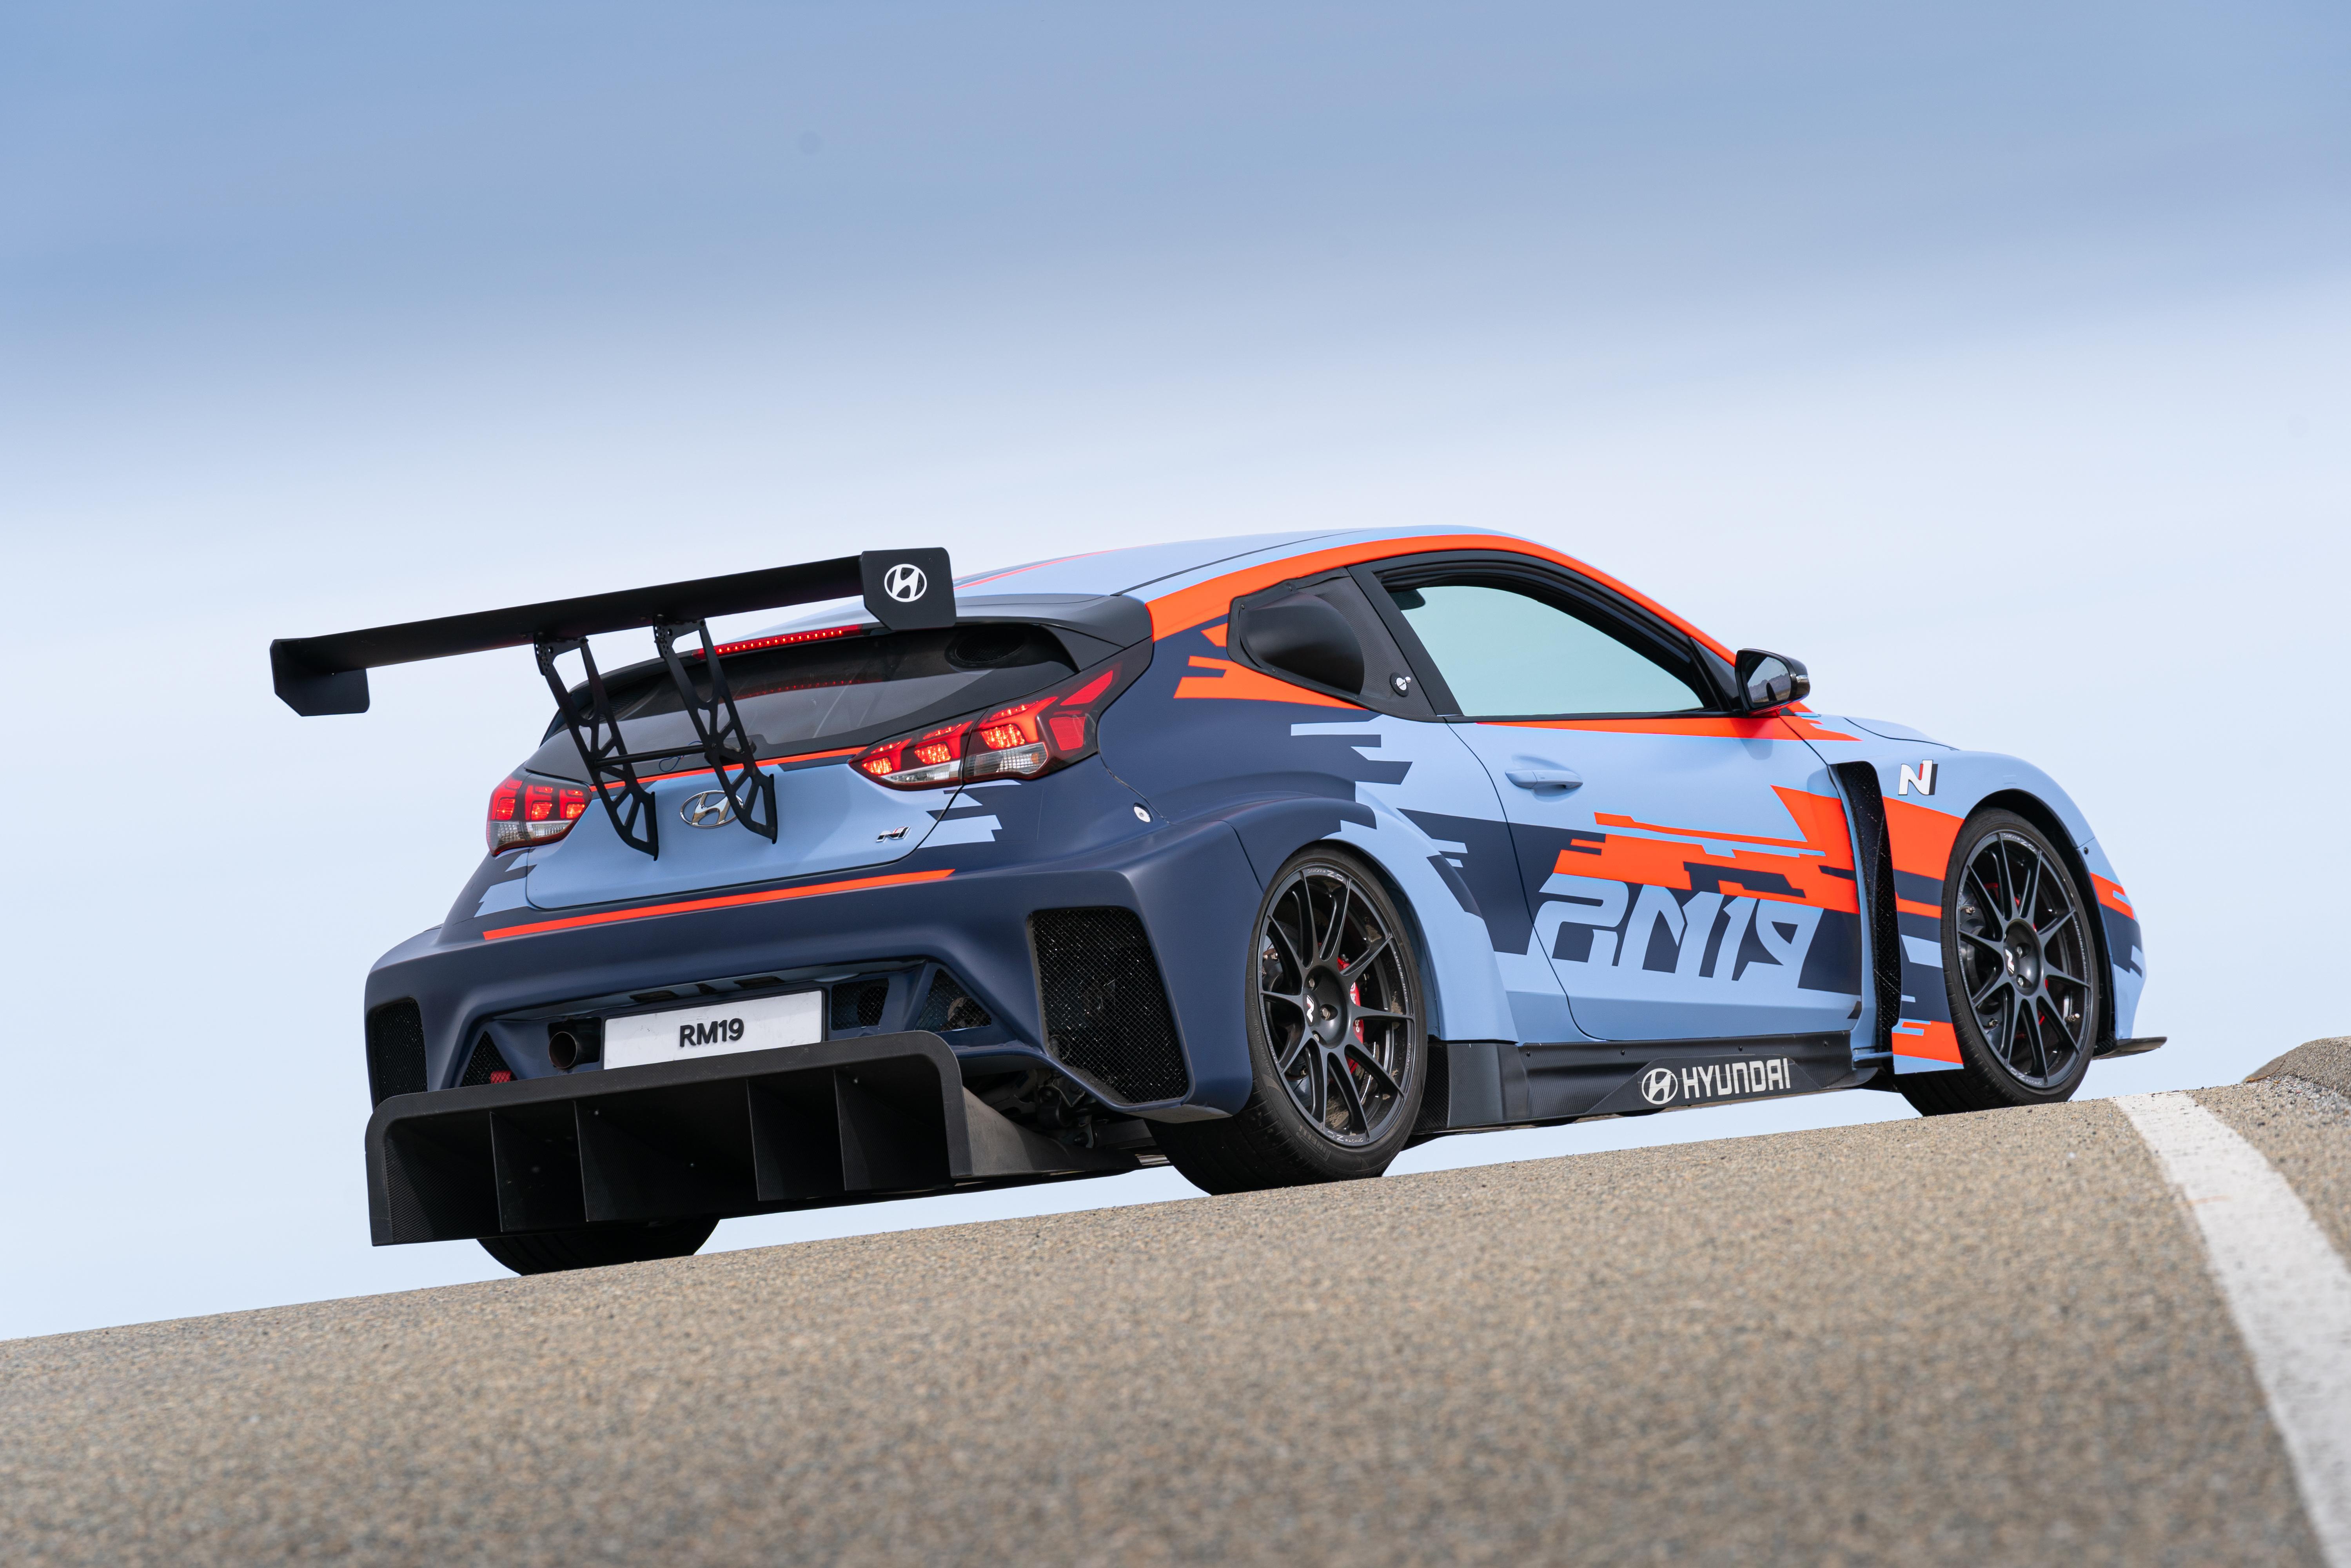 Hyundai N Brand Reveals All-New RM19 Racing Midship Sports Car Prototype